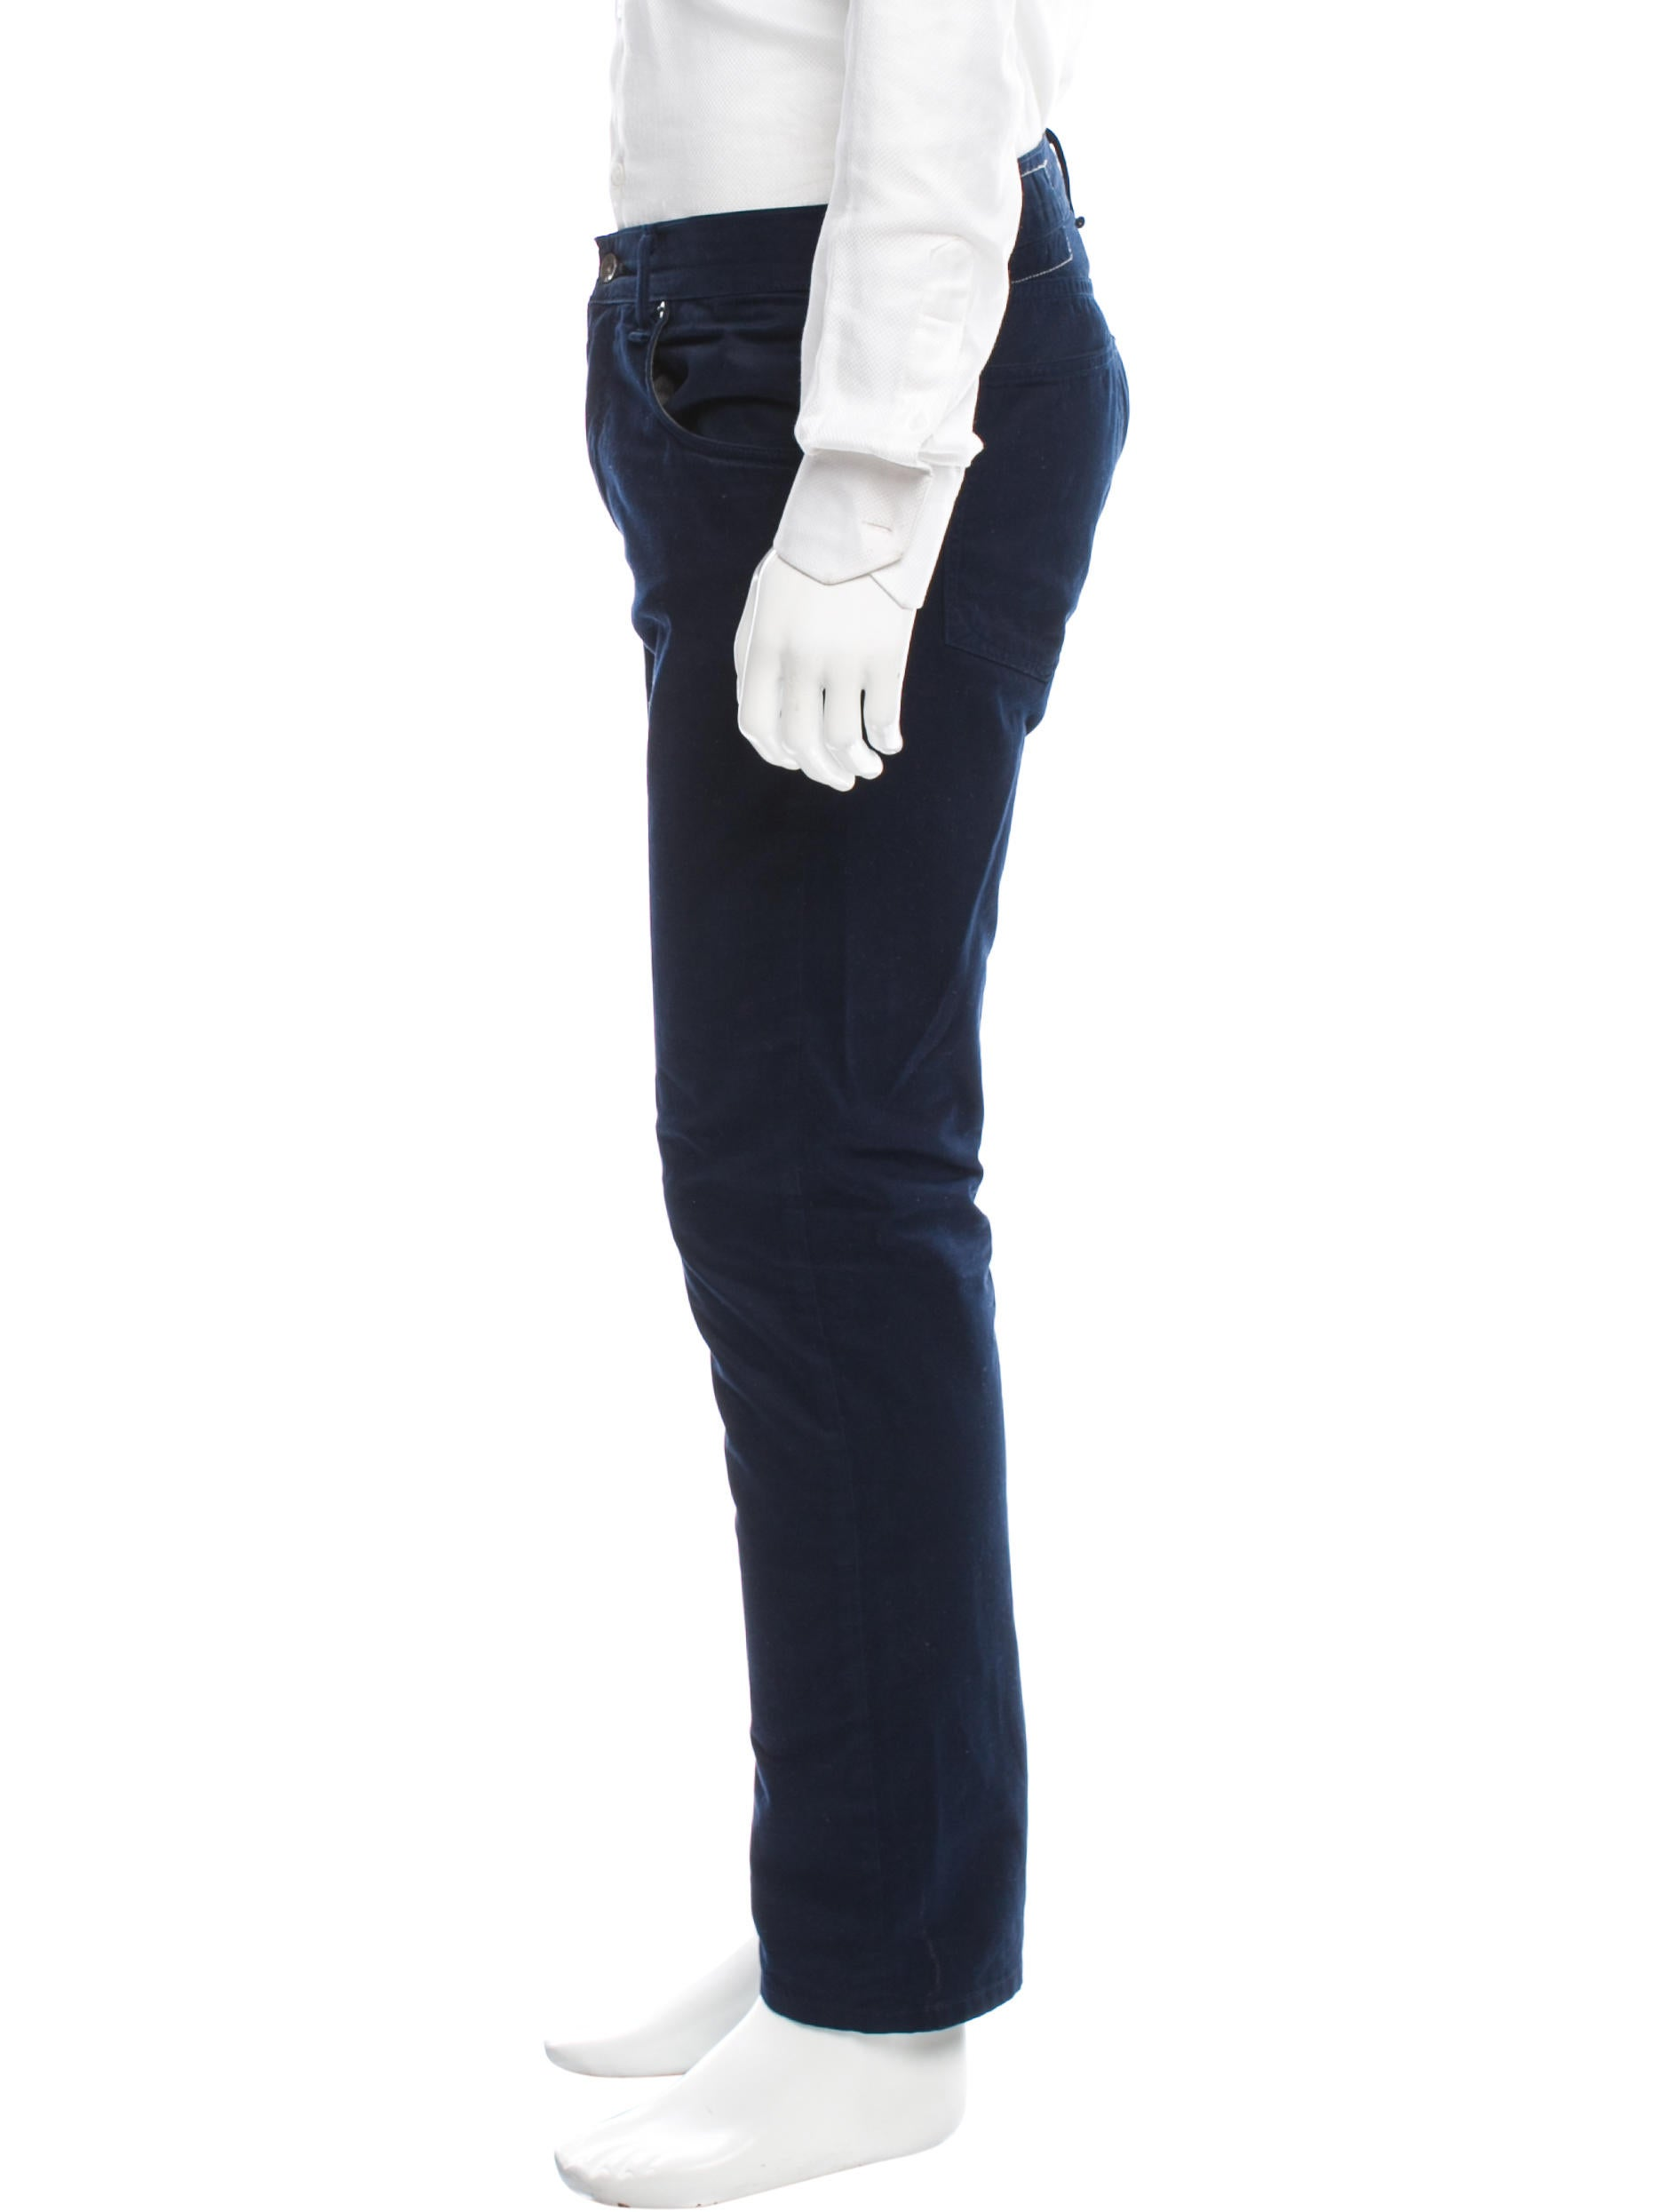 Find Wrangler Men's Retro Slim Fit Straight Leg Jean in the Men's Jeans category at Tractor Supply truexfilepv.cf Wrangler Retro Slim Straight Fit J'ean4/5(58).